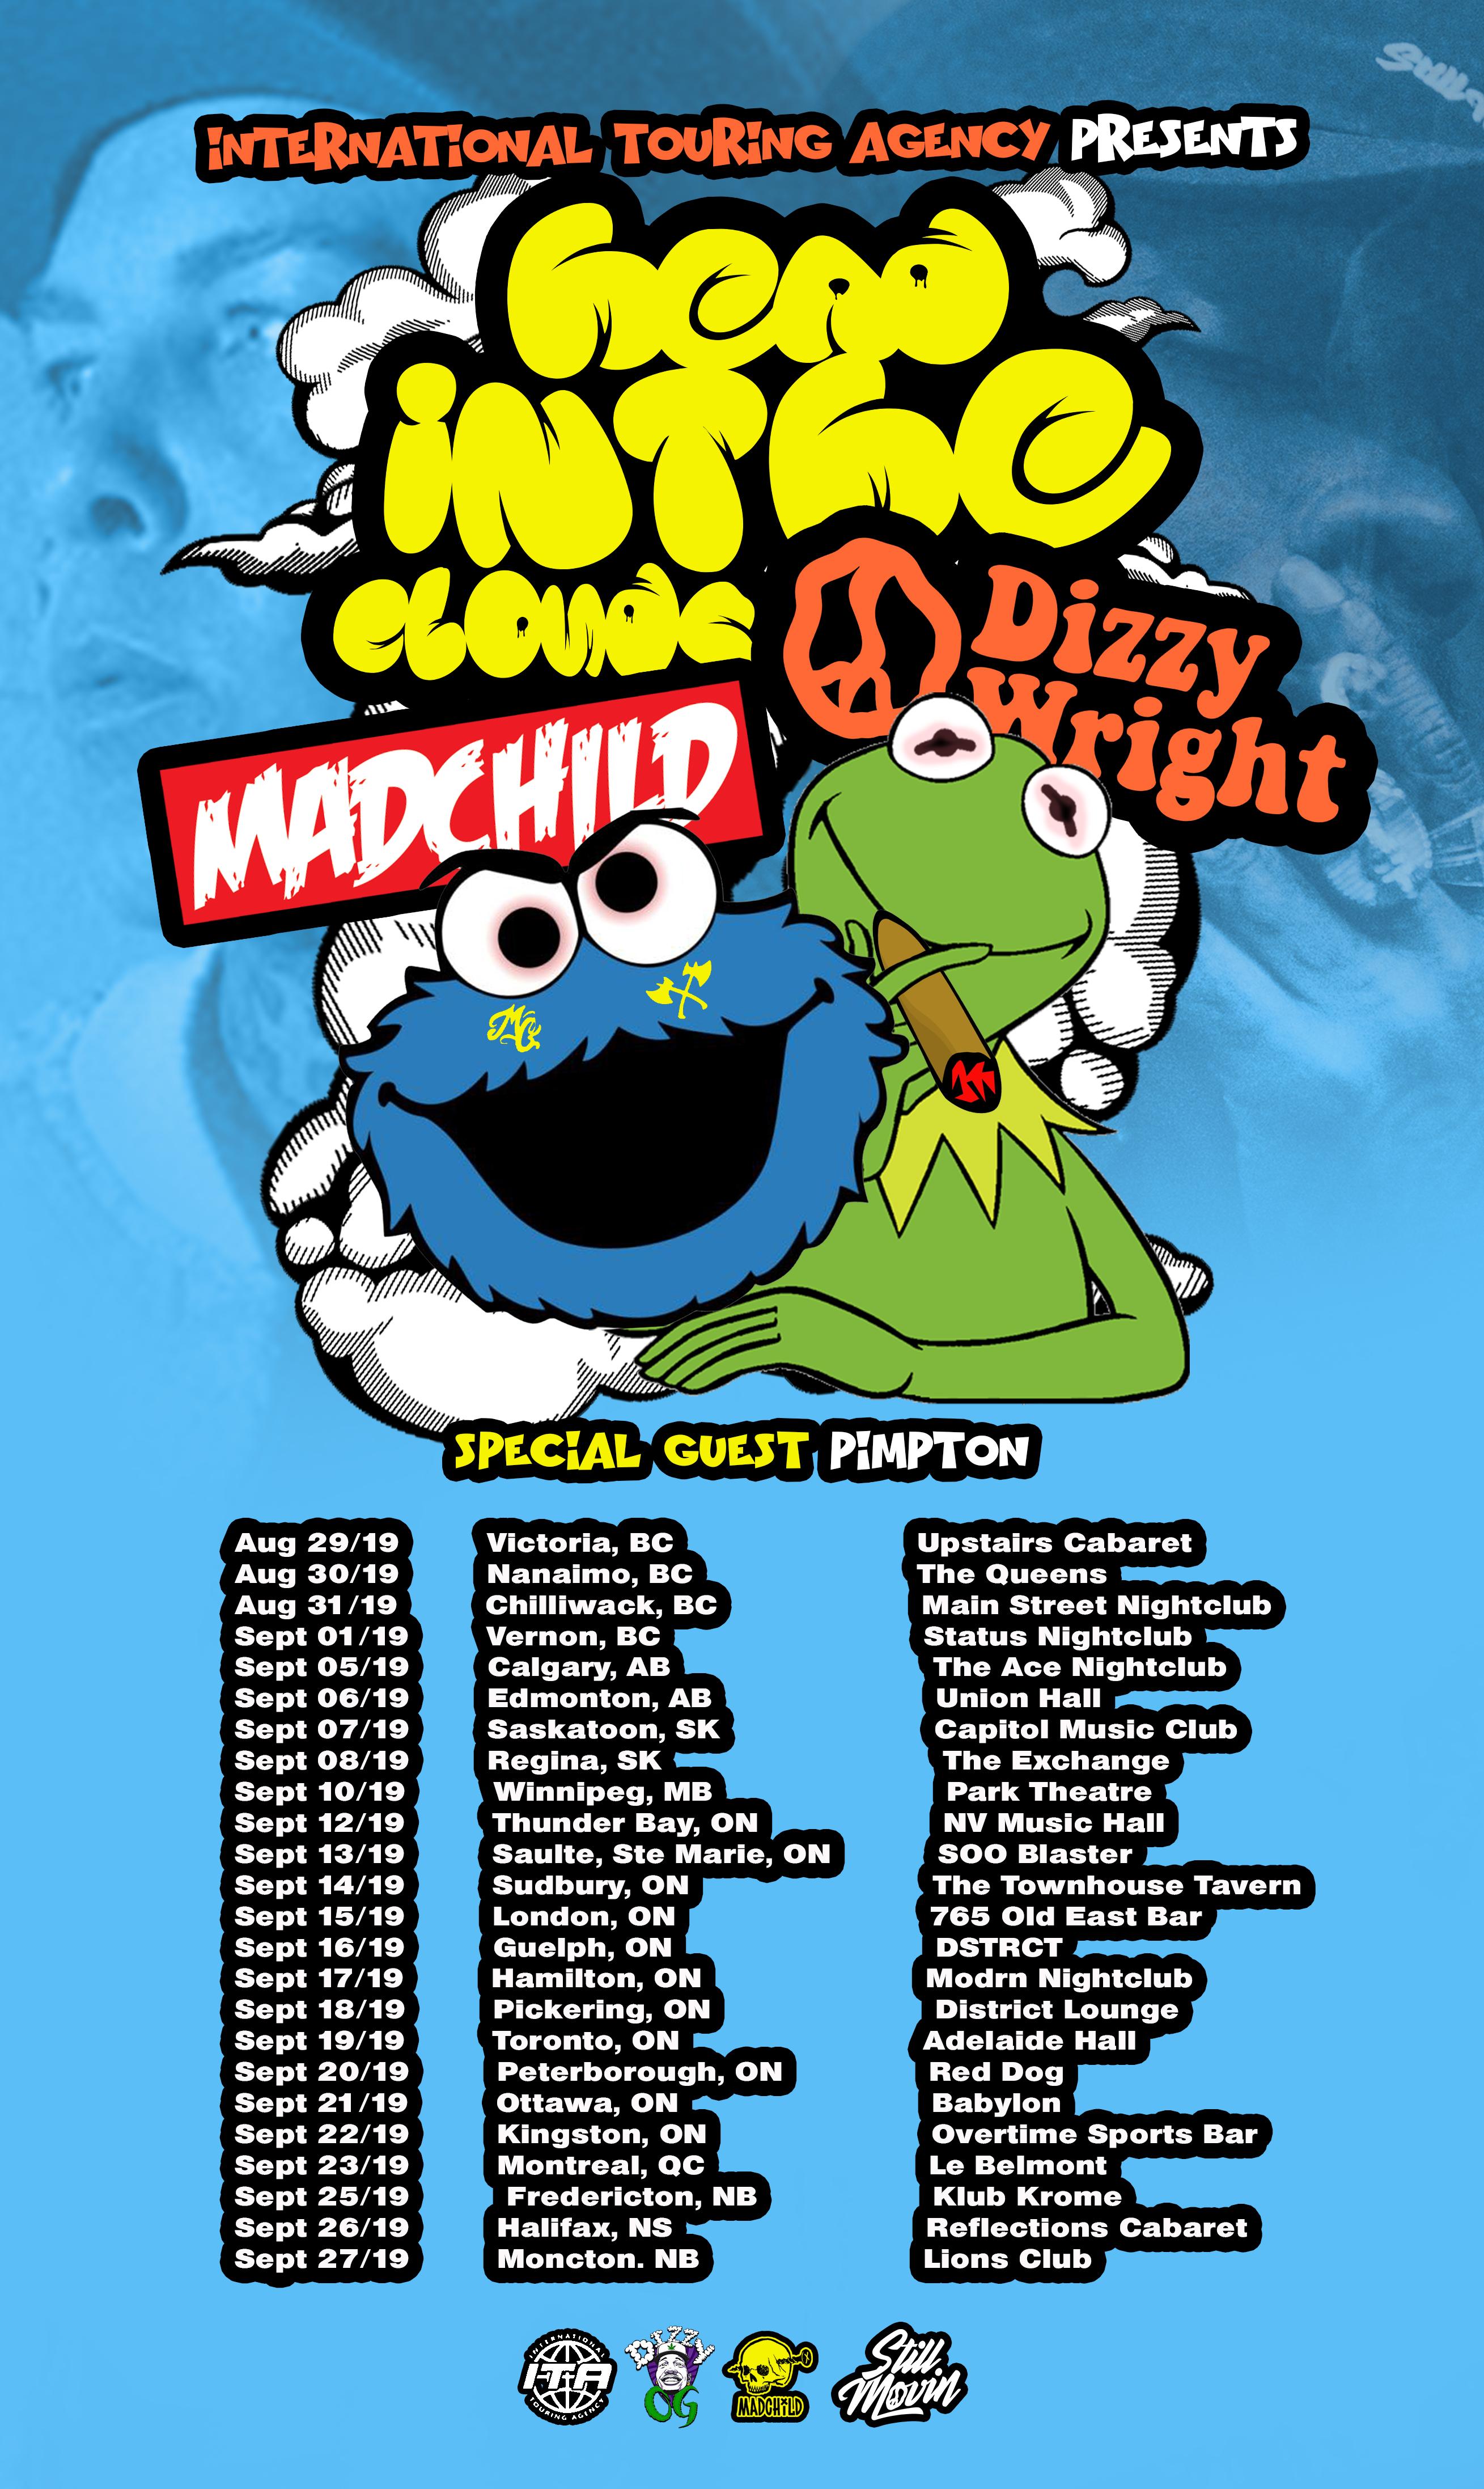 Dizzy Wright & Madchild Announce Co-Headlining Canadian Tour